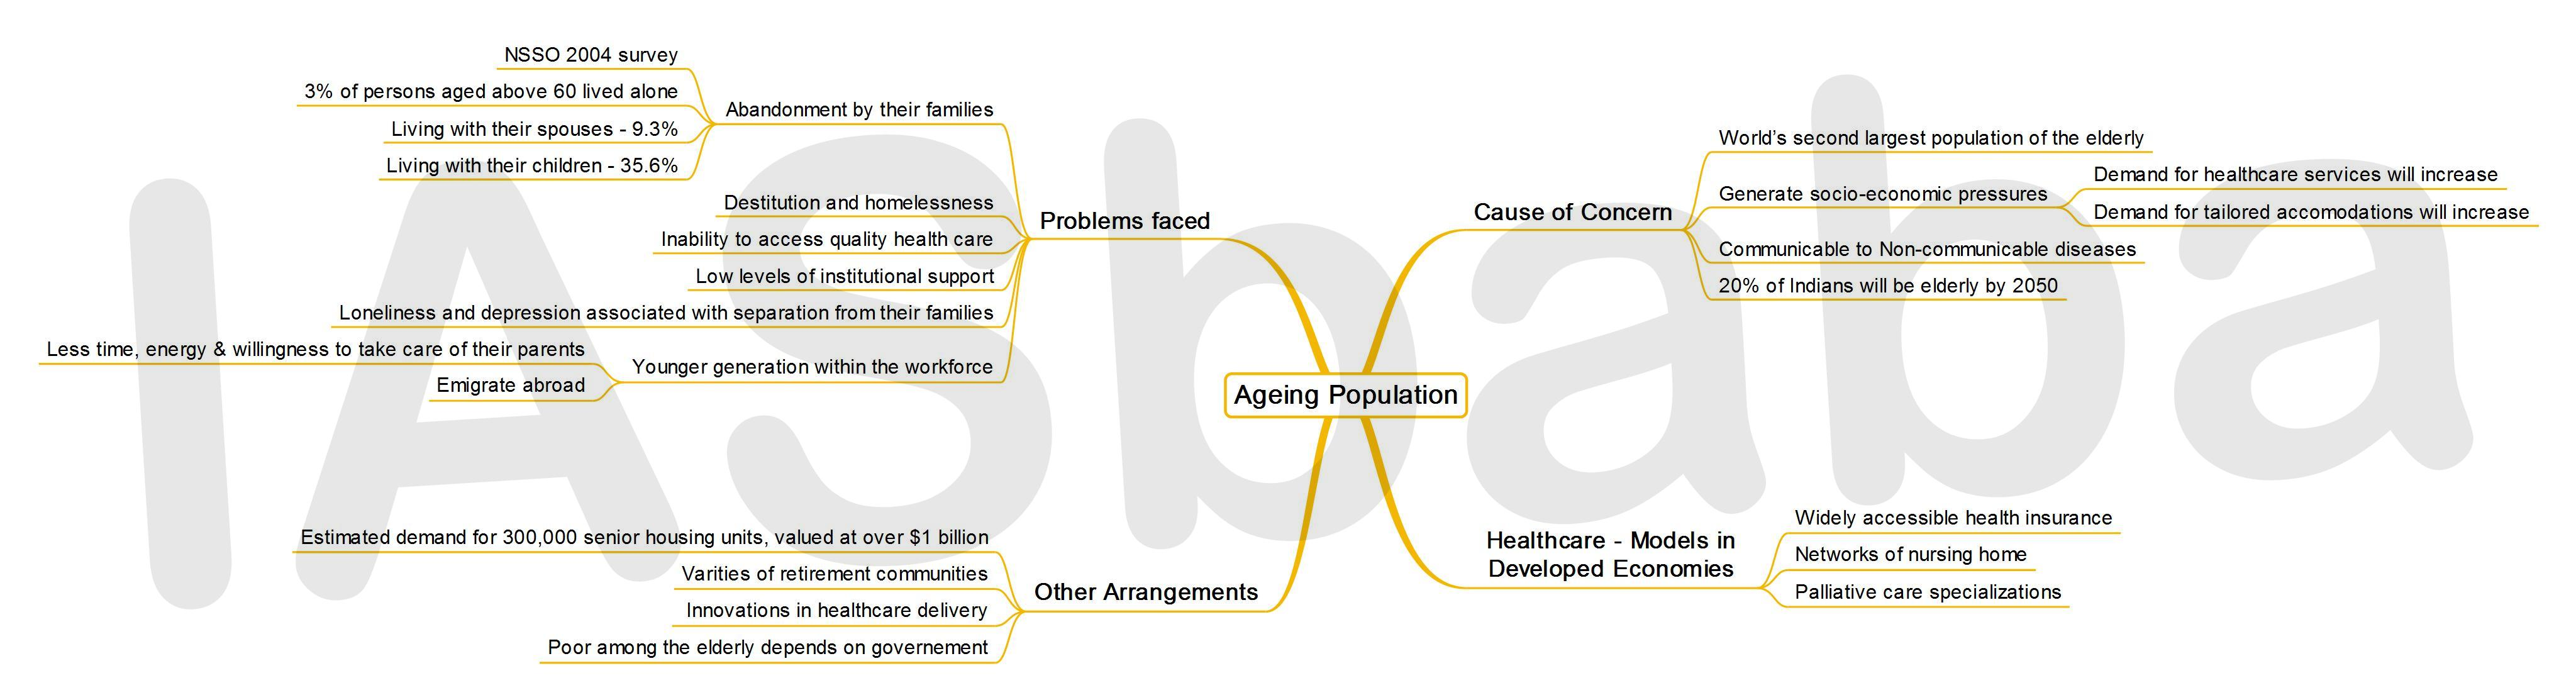 IASbaba's MINDMAP : Issue - Ageing Population